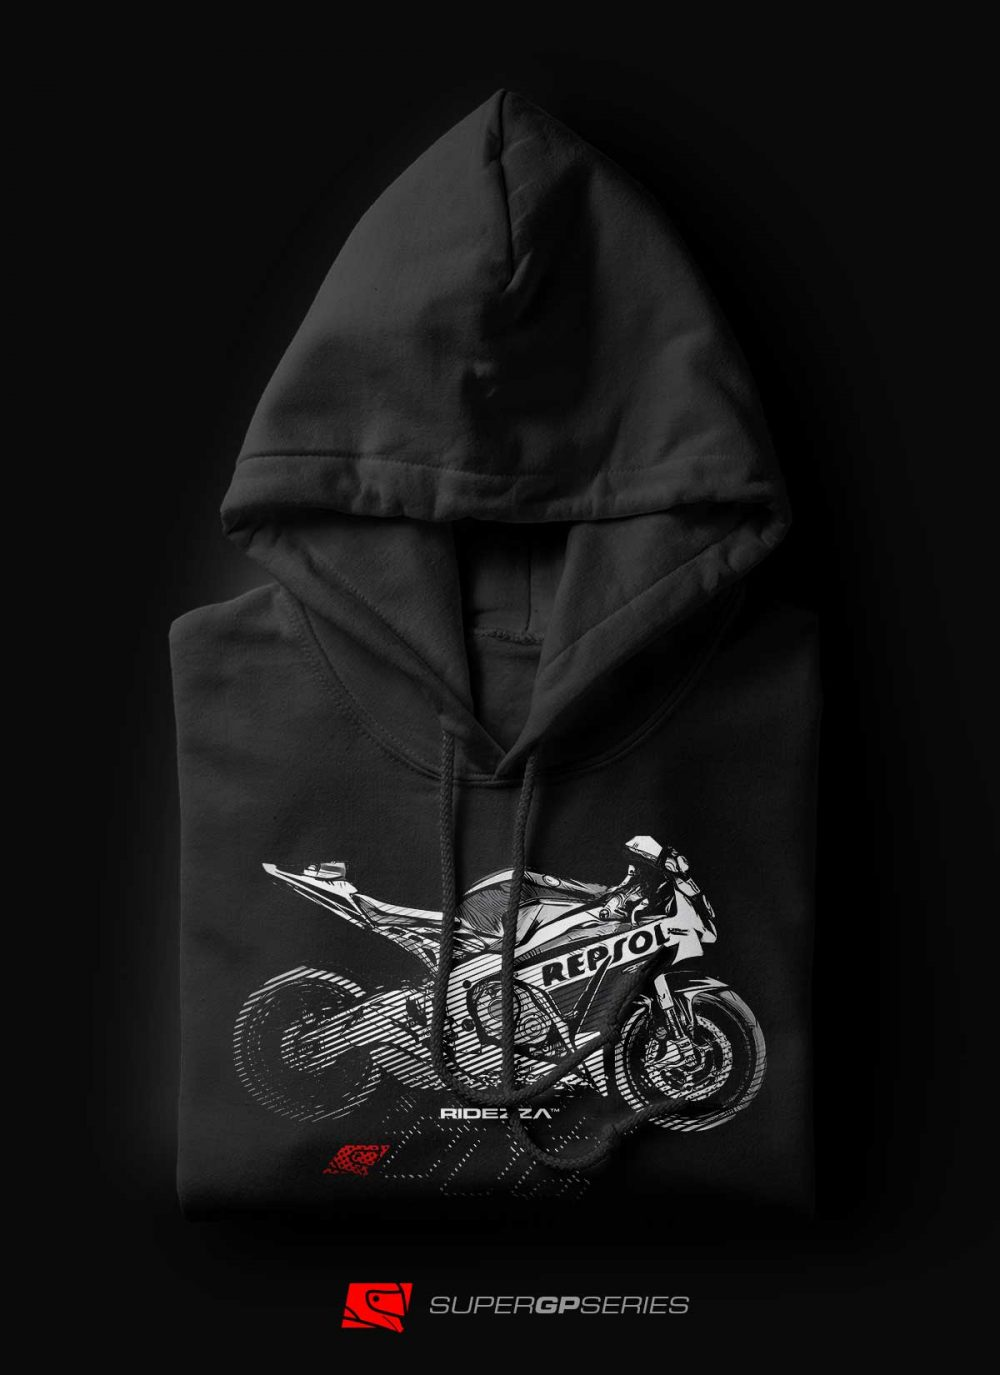 Ridezza CBR Repsol SuperGP Series Hoodie